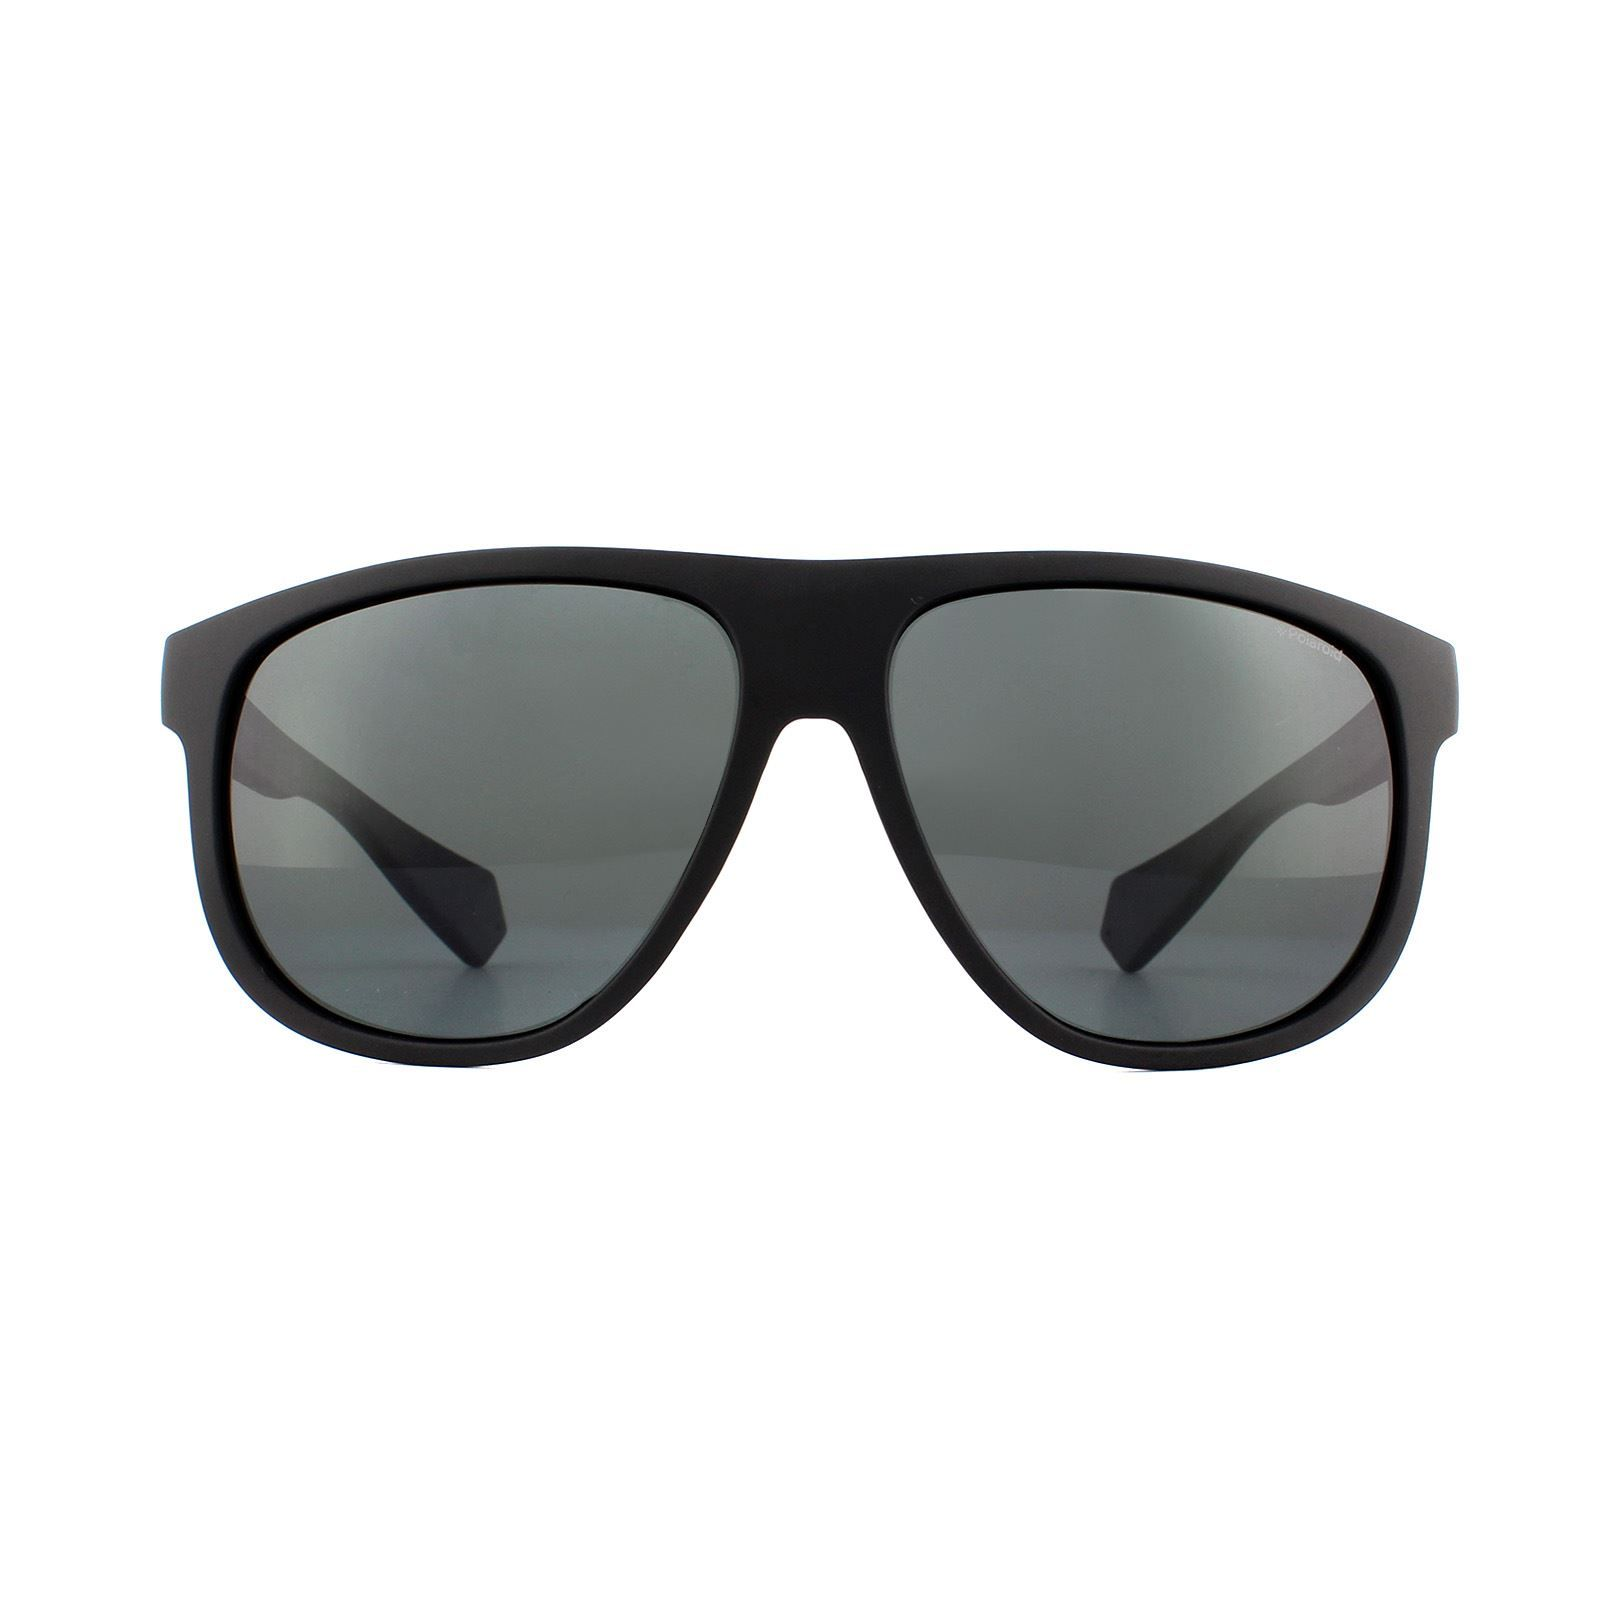 Polaroid Sunglasses PLD 2080/S 003 M9 Matte Black Grey Polarized